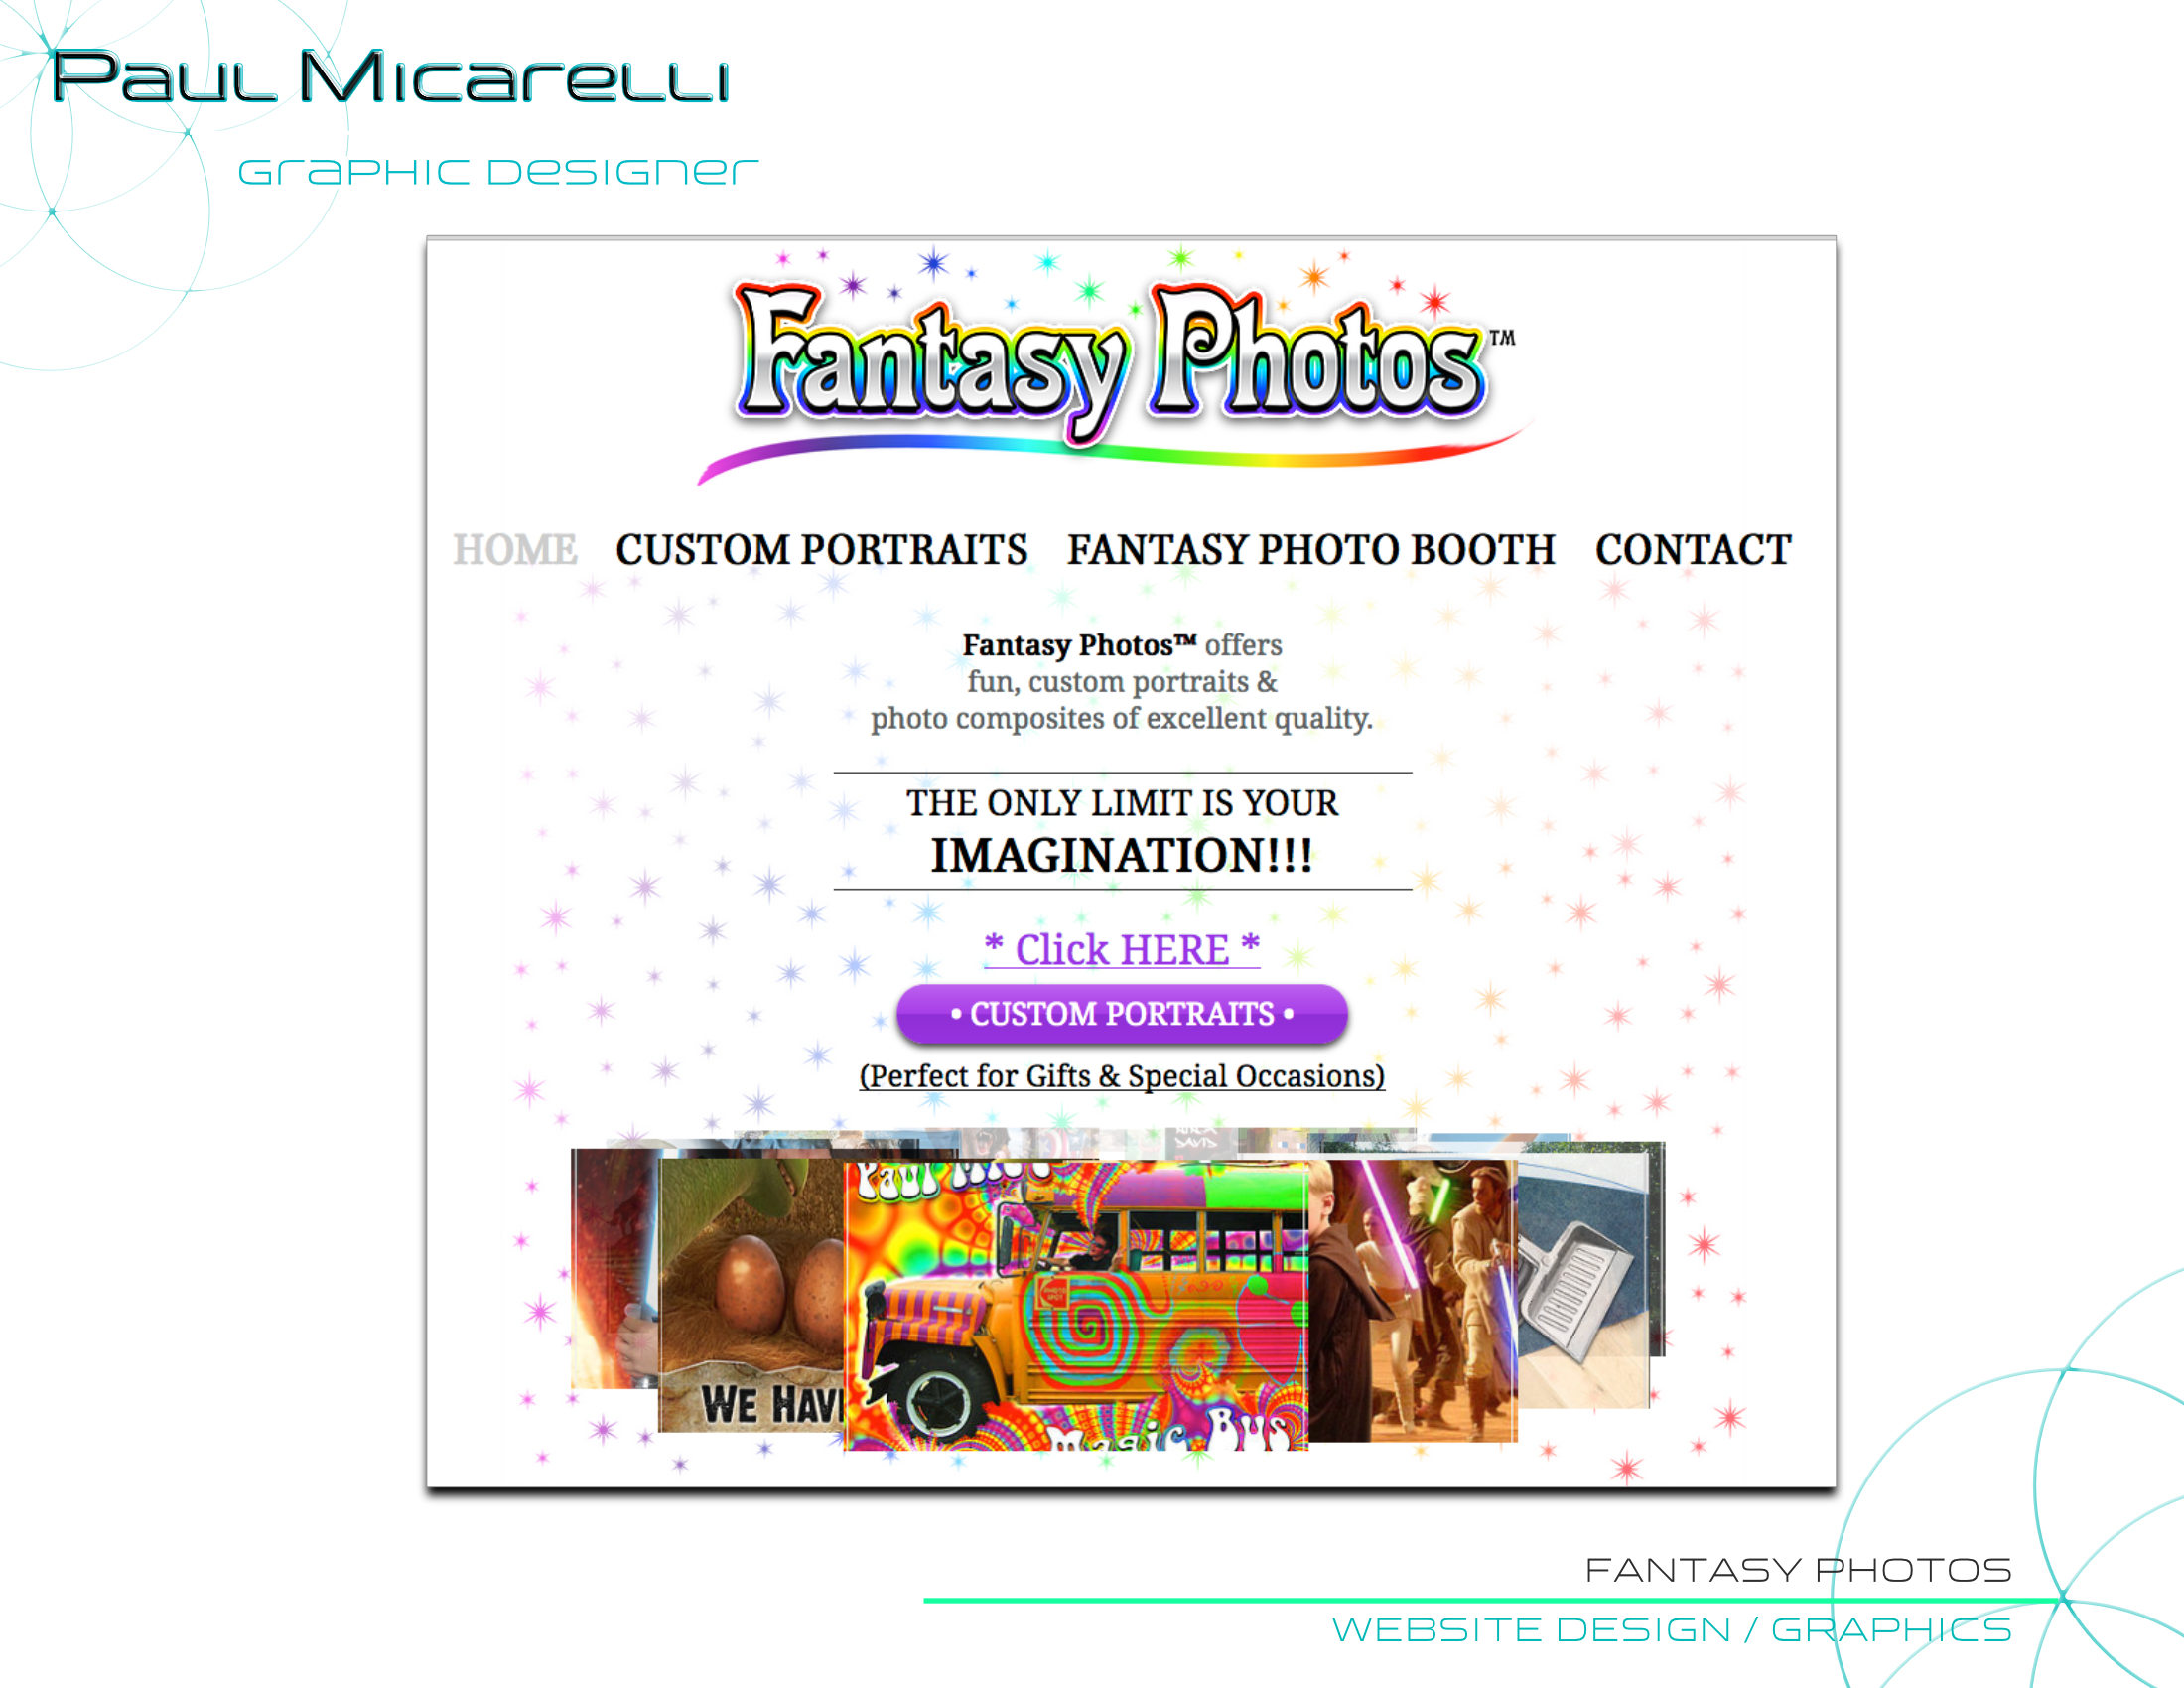 Paul-Micarelli-Fantasy Photos Website